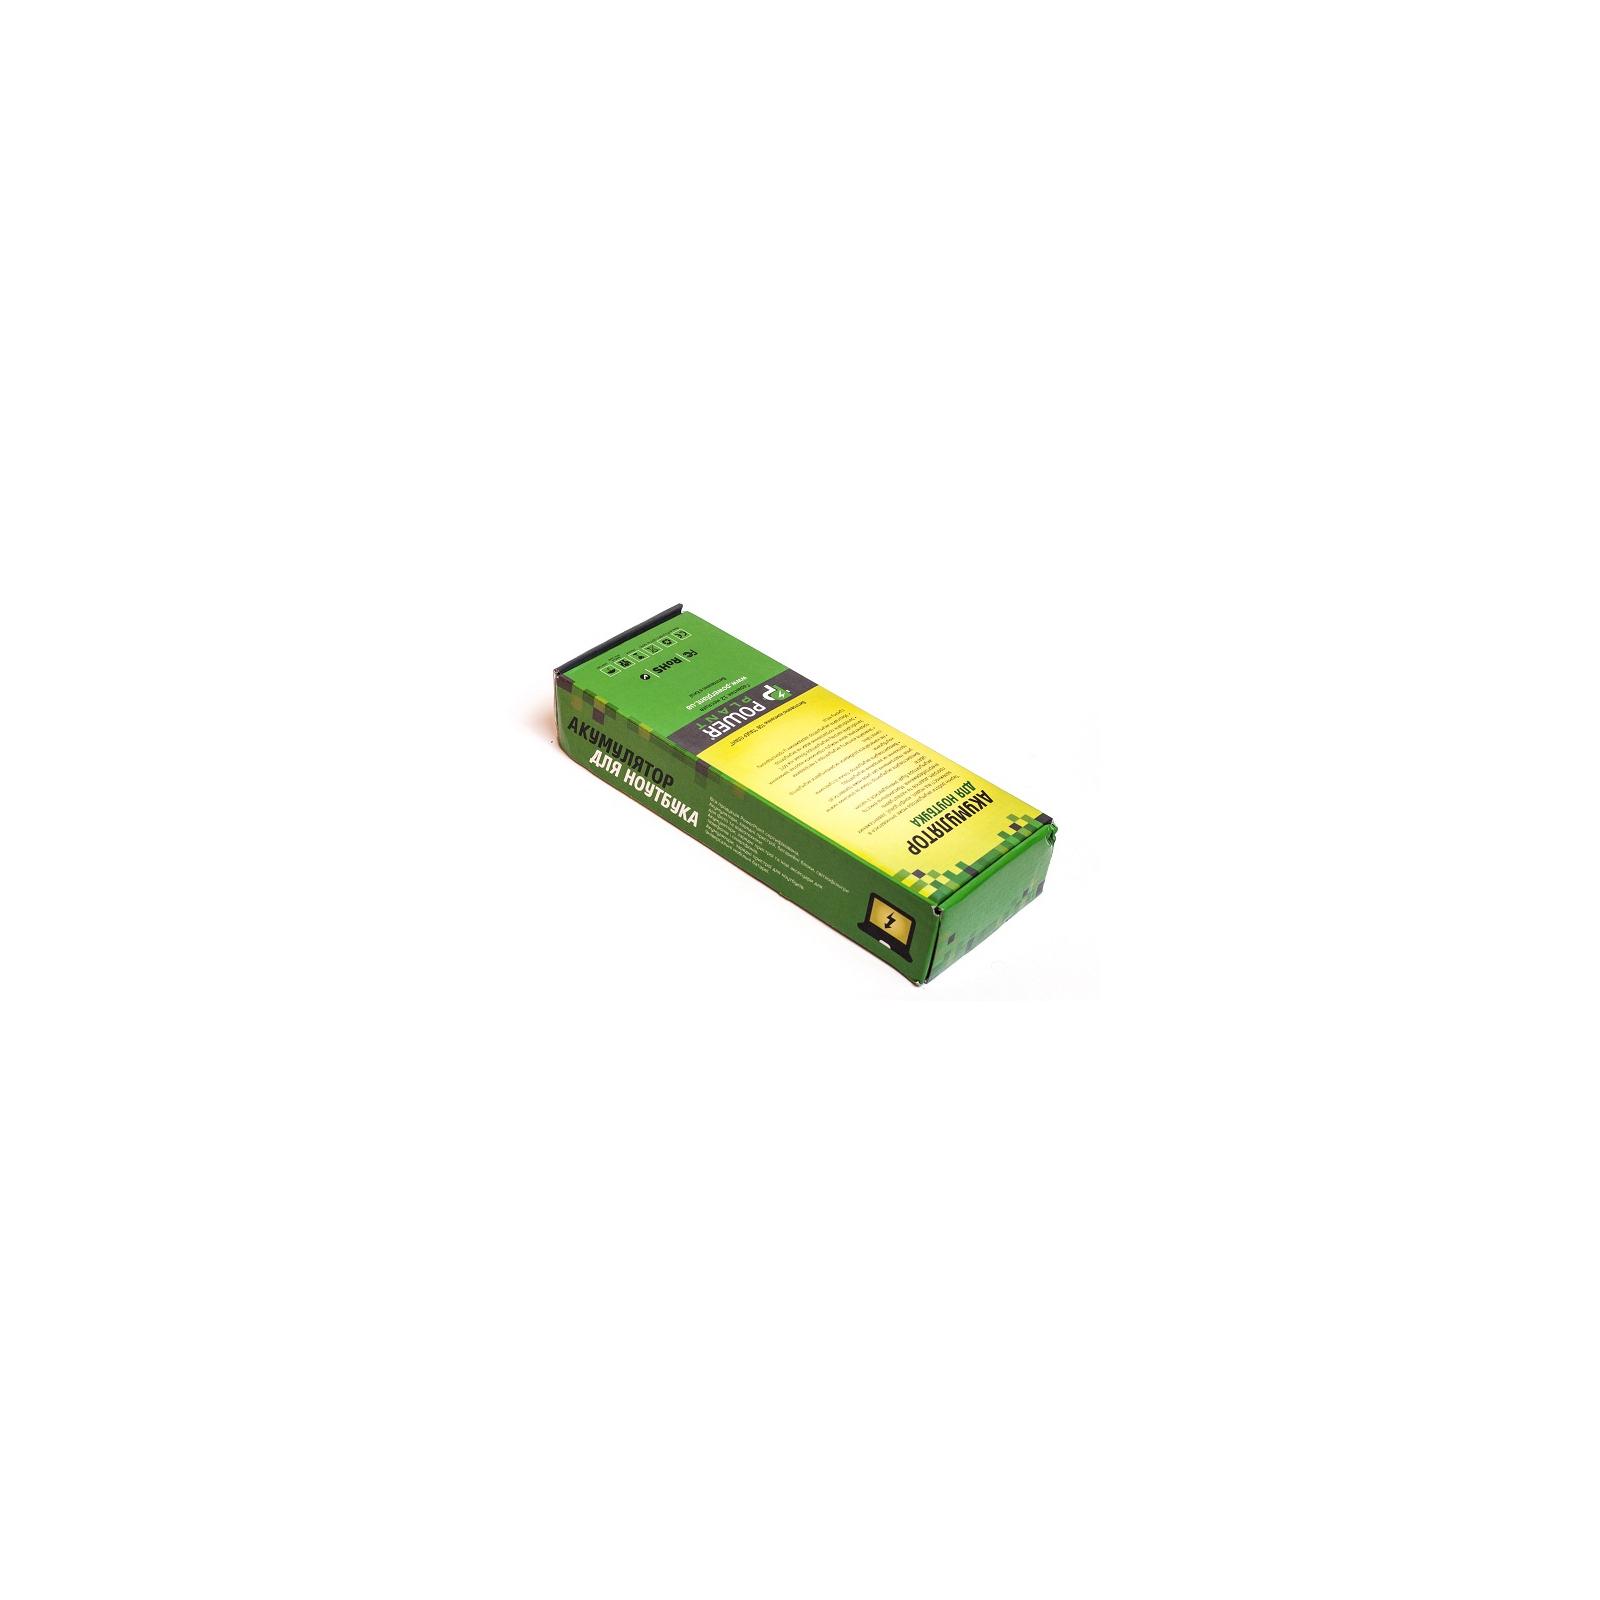 Аккумулятор для ноутбука GATEWAY M-150 (SQU-715, GY4044LH) 11.1V 5200mAh PowerPlant (NB00000120) изображение 2